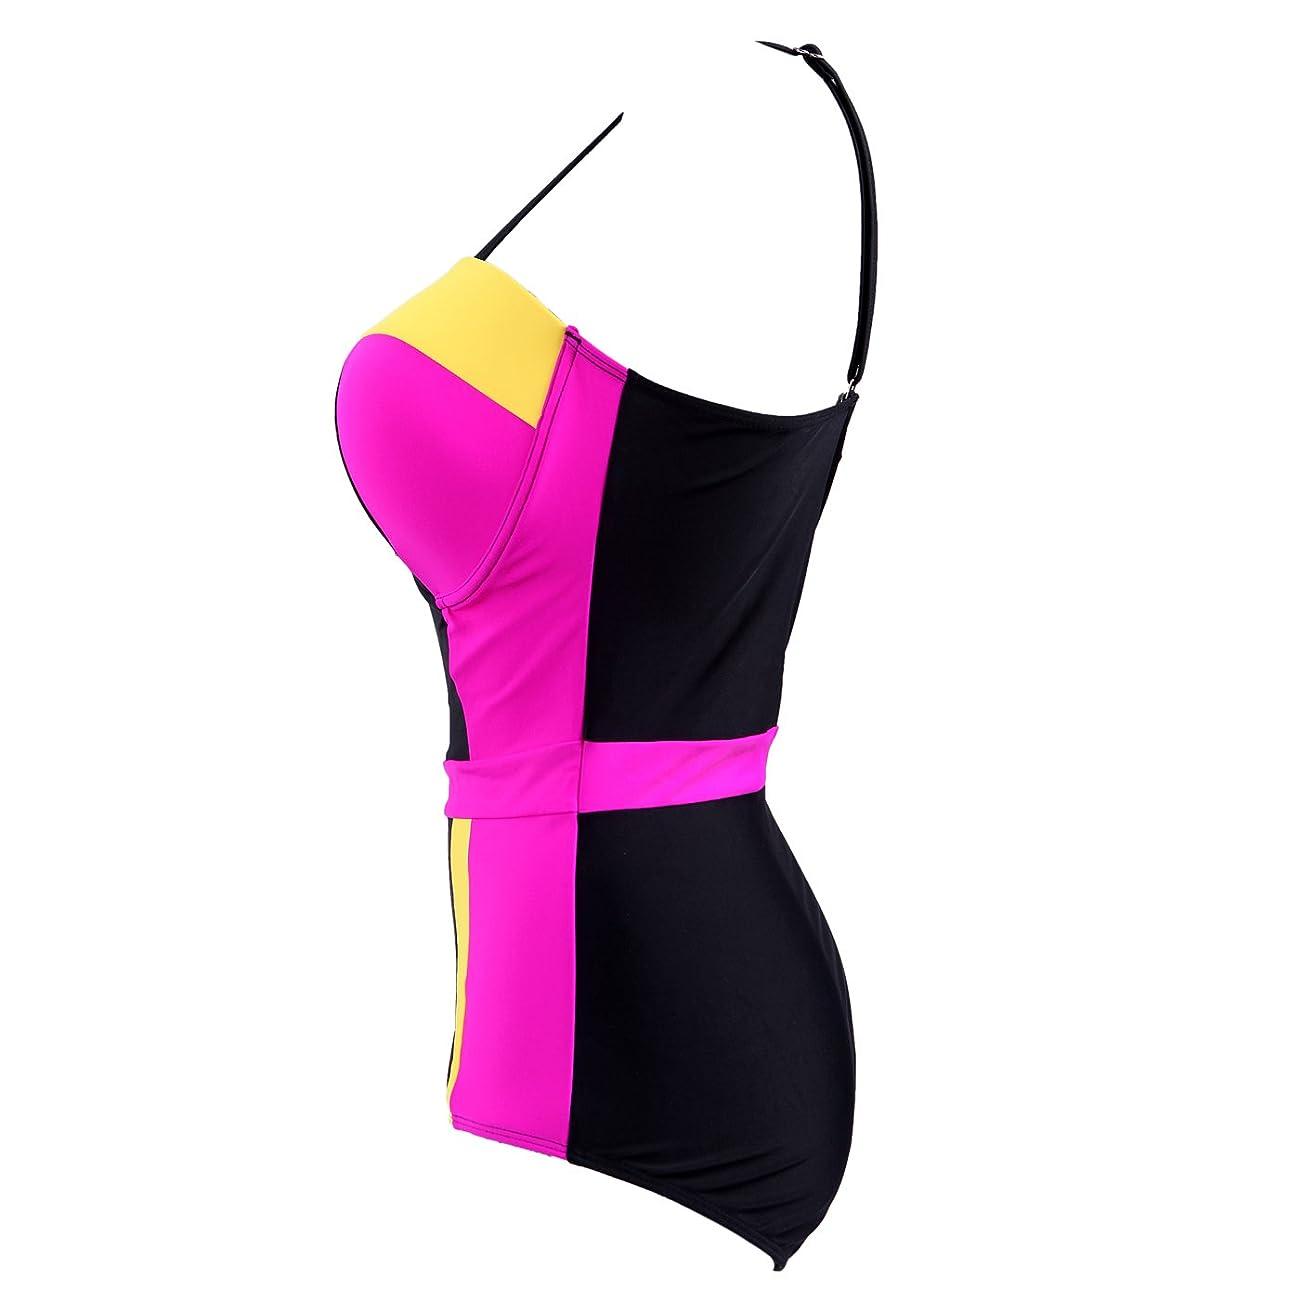 HDE Women's Retro One Piece Swimsuit Plus Size Padded Halter Vintage Swimsuit 1